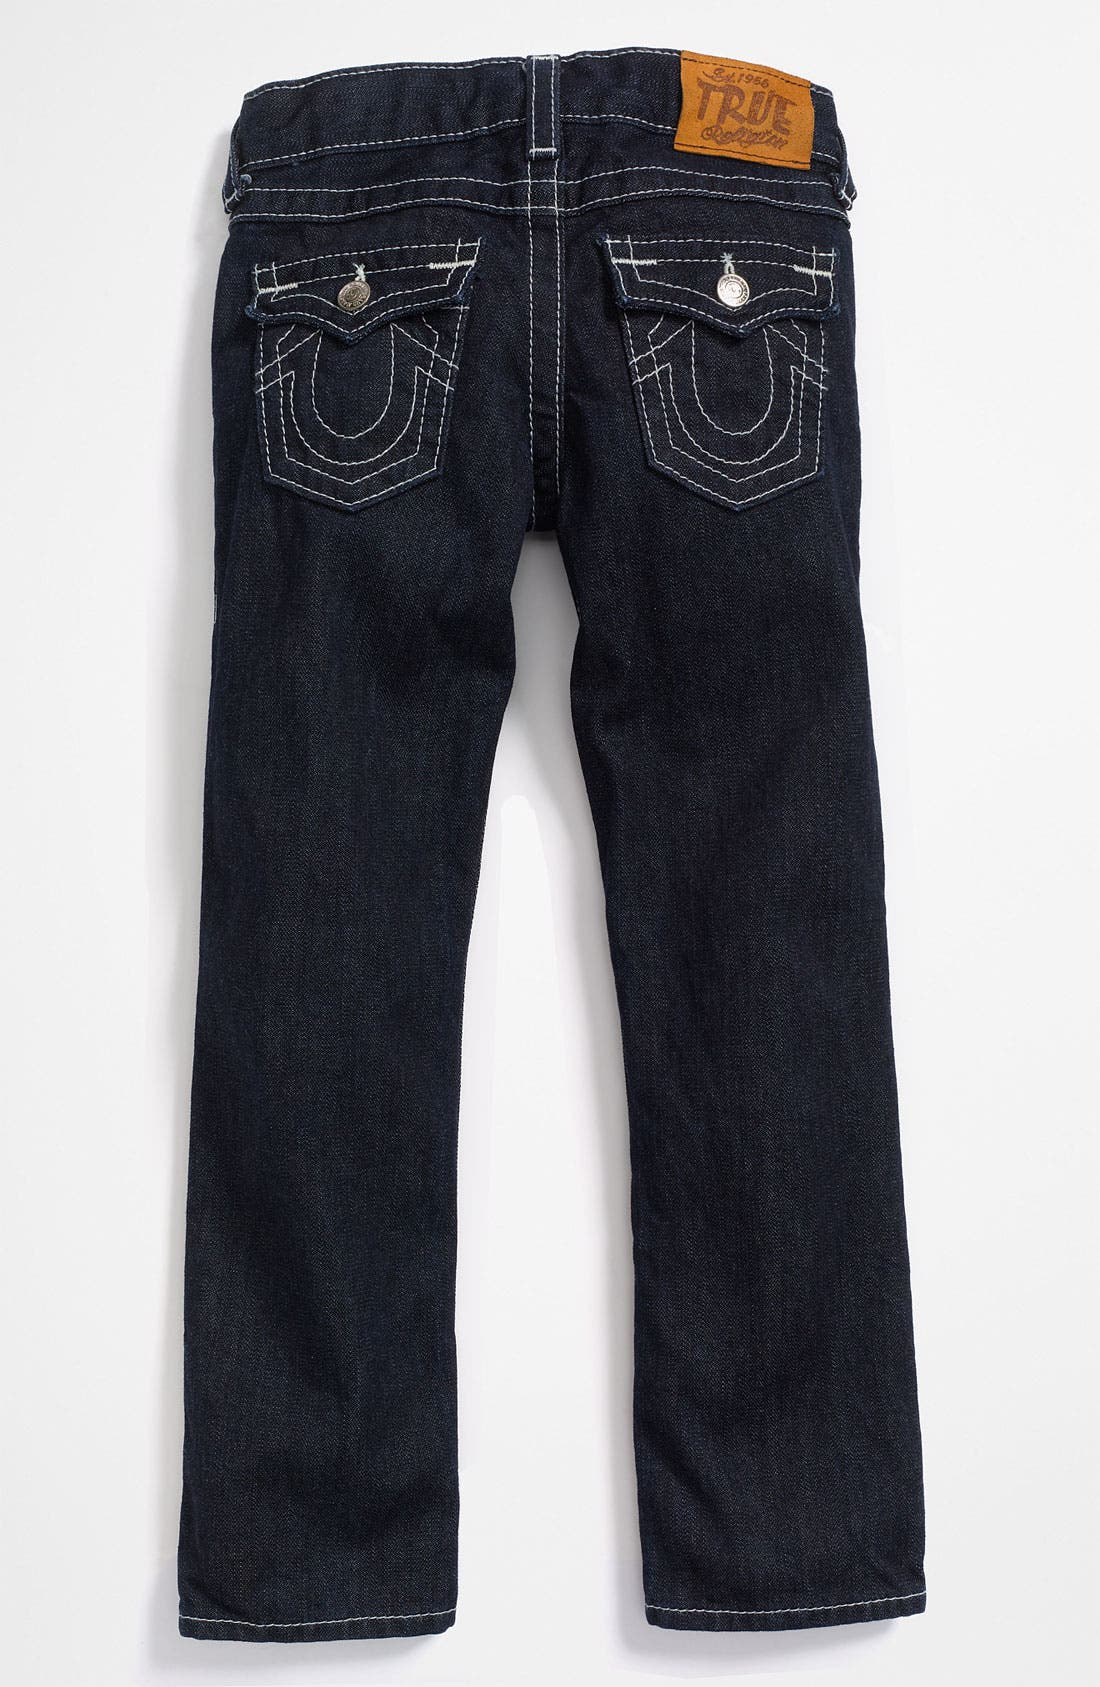 Main Image - True Religion Brand Jeans 'Jack' Straight Leg Jeans (Toddler)